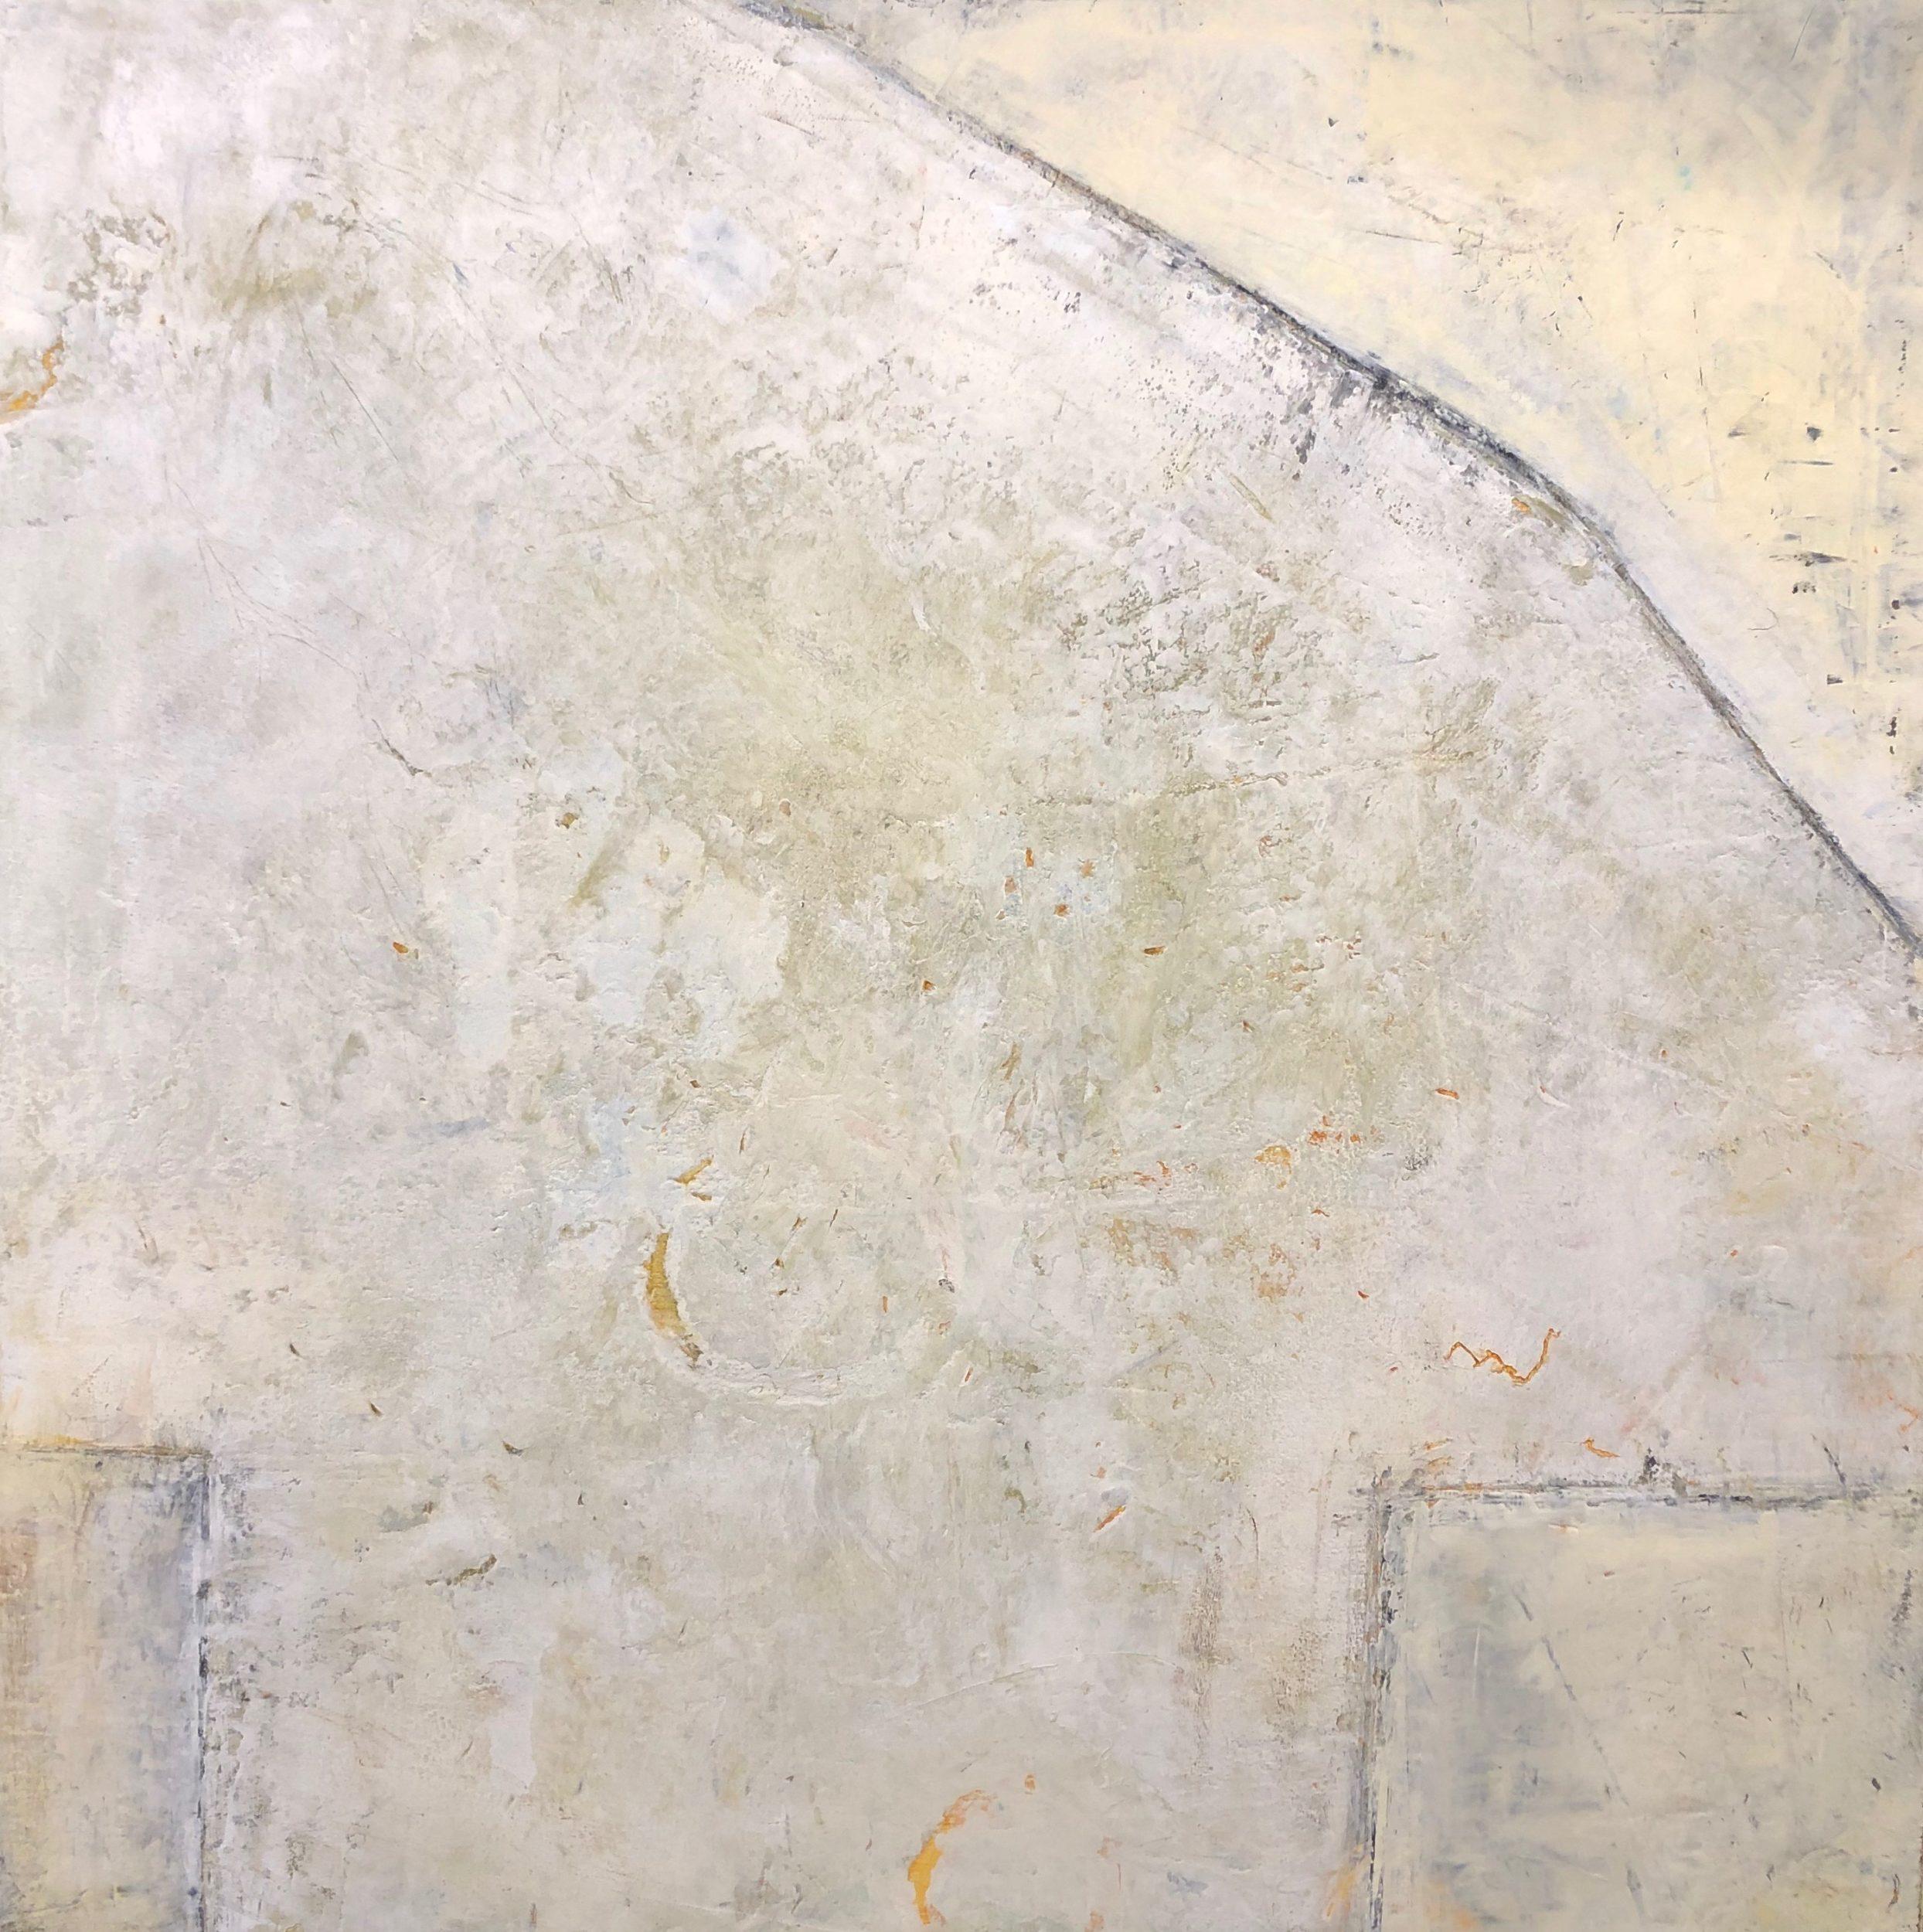 Walls of Nineveh IV 40x40 Cold Wax & Oil on Wood Panels